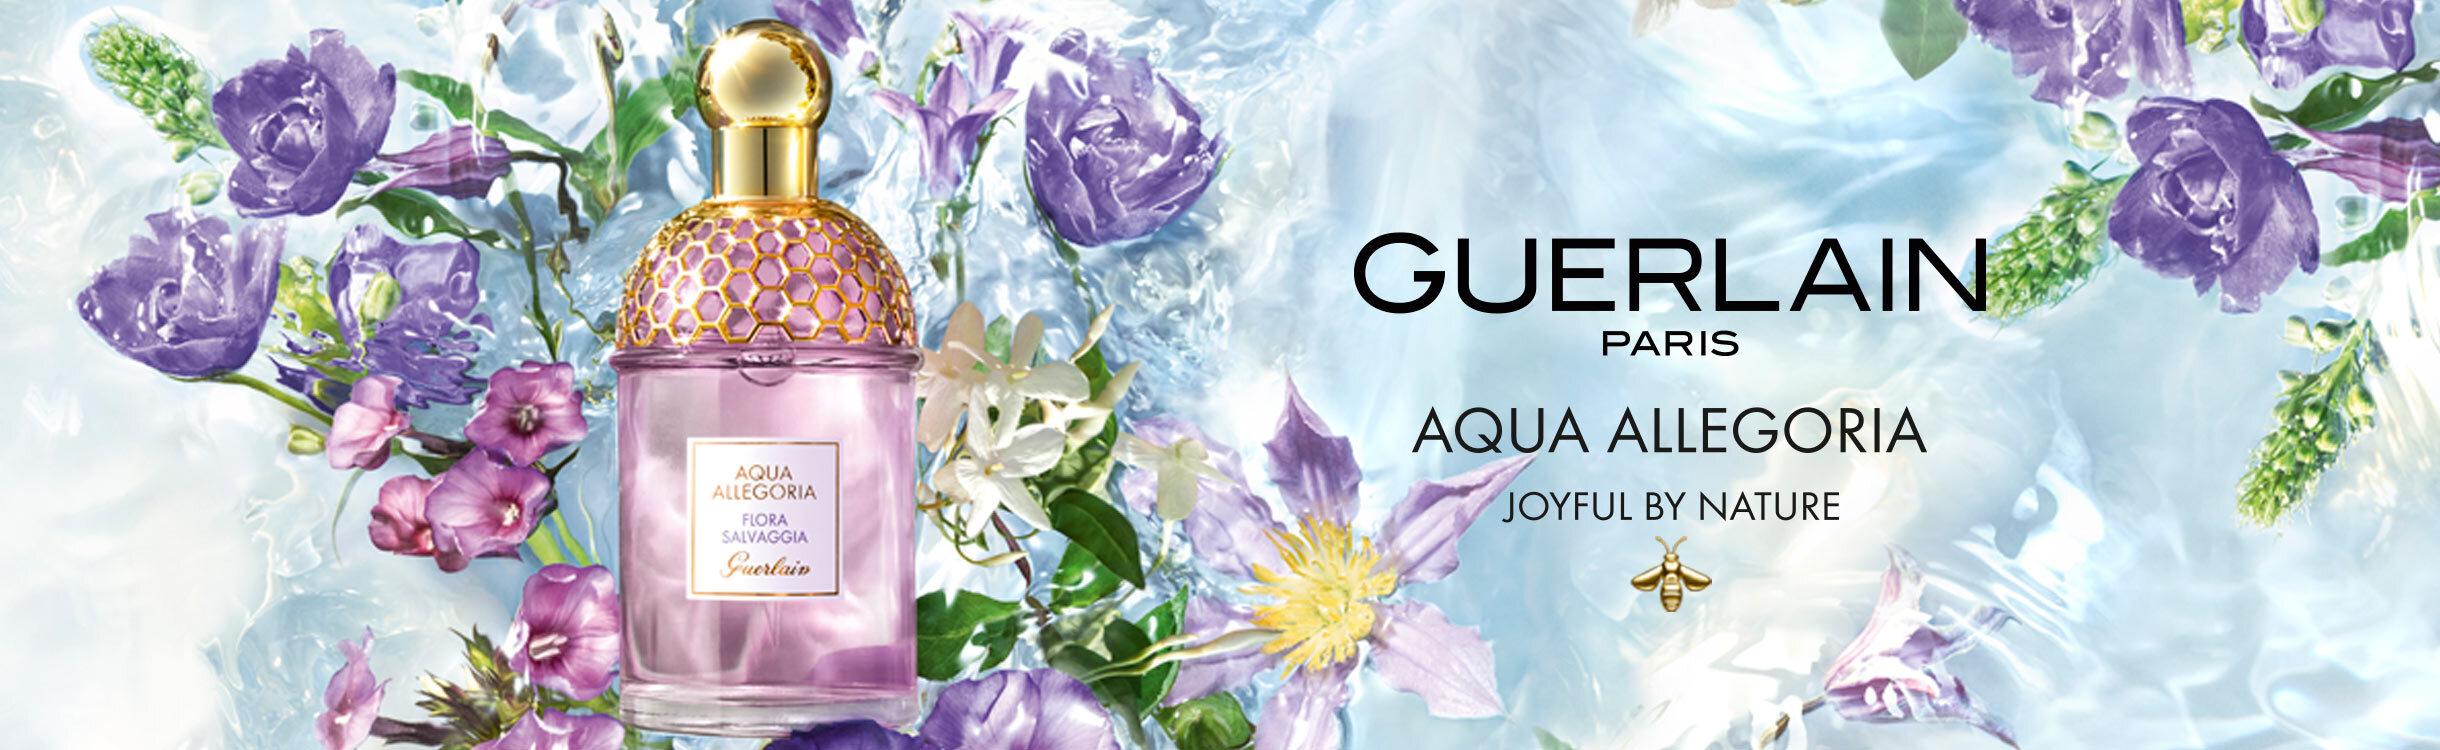 Perfumes e Perfumaria Guerlain Unissex